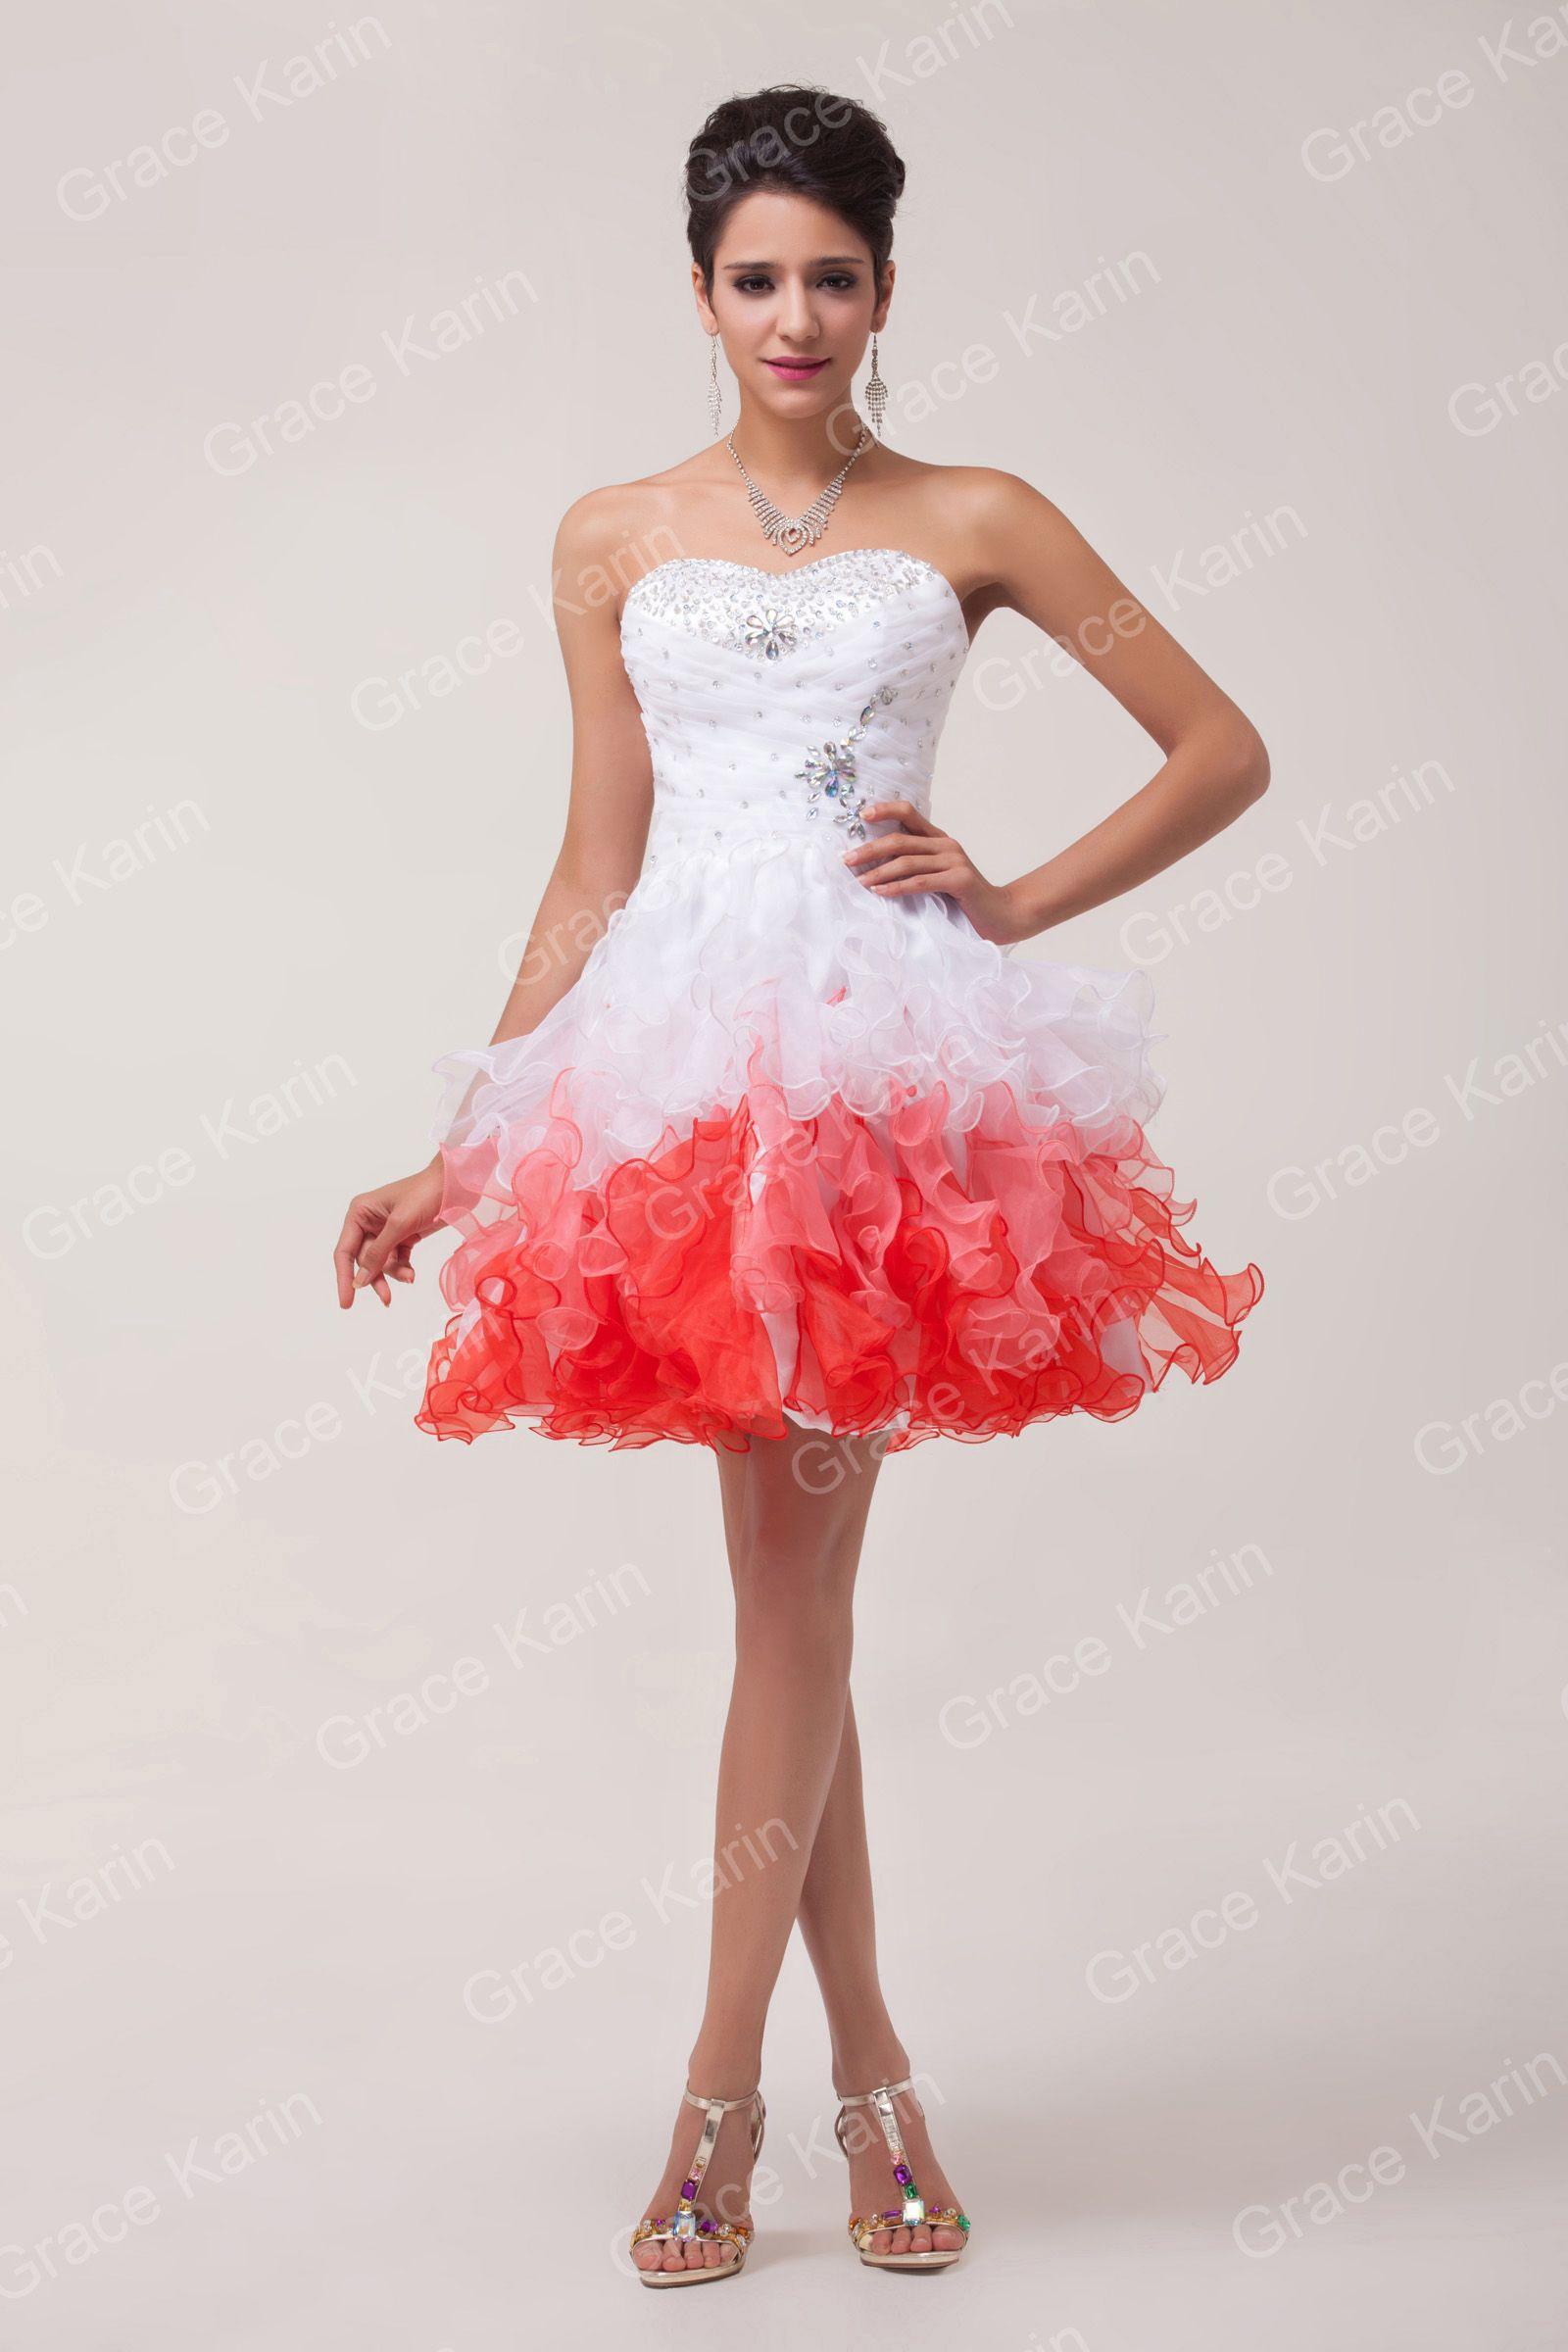 Beste Tutu Prom Kleid Fotos - Brautkleider Ideen - bodmaslive.com